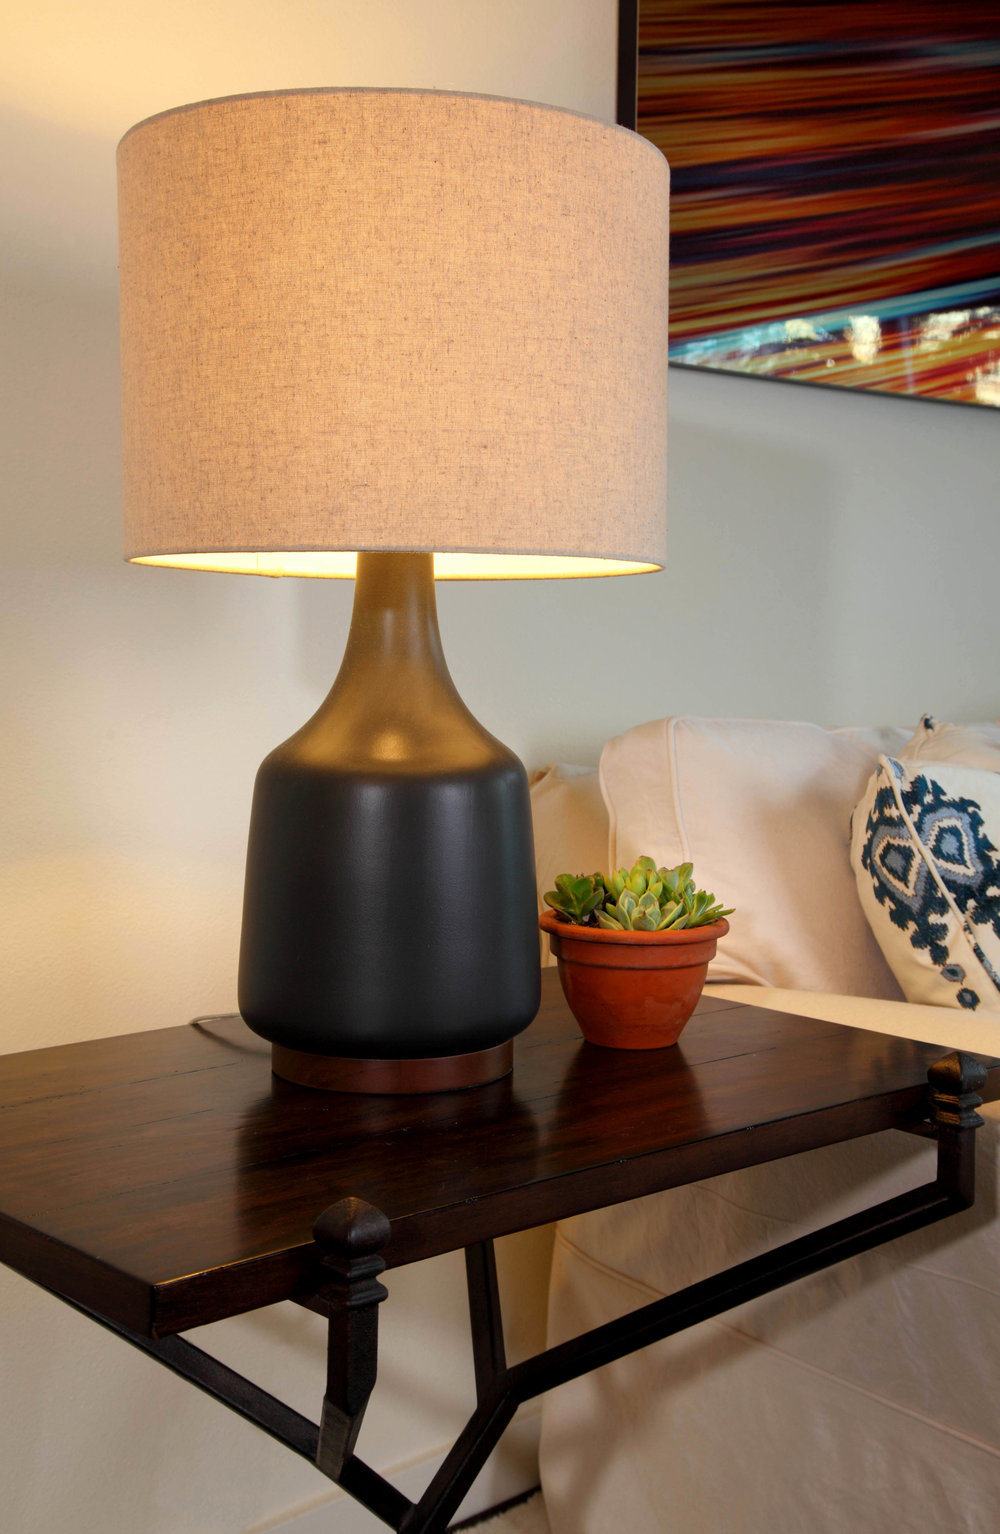 Sarah-barnard-design-modern-bachelorpad-sidetable-lamp.jpg